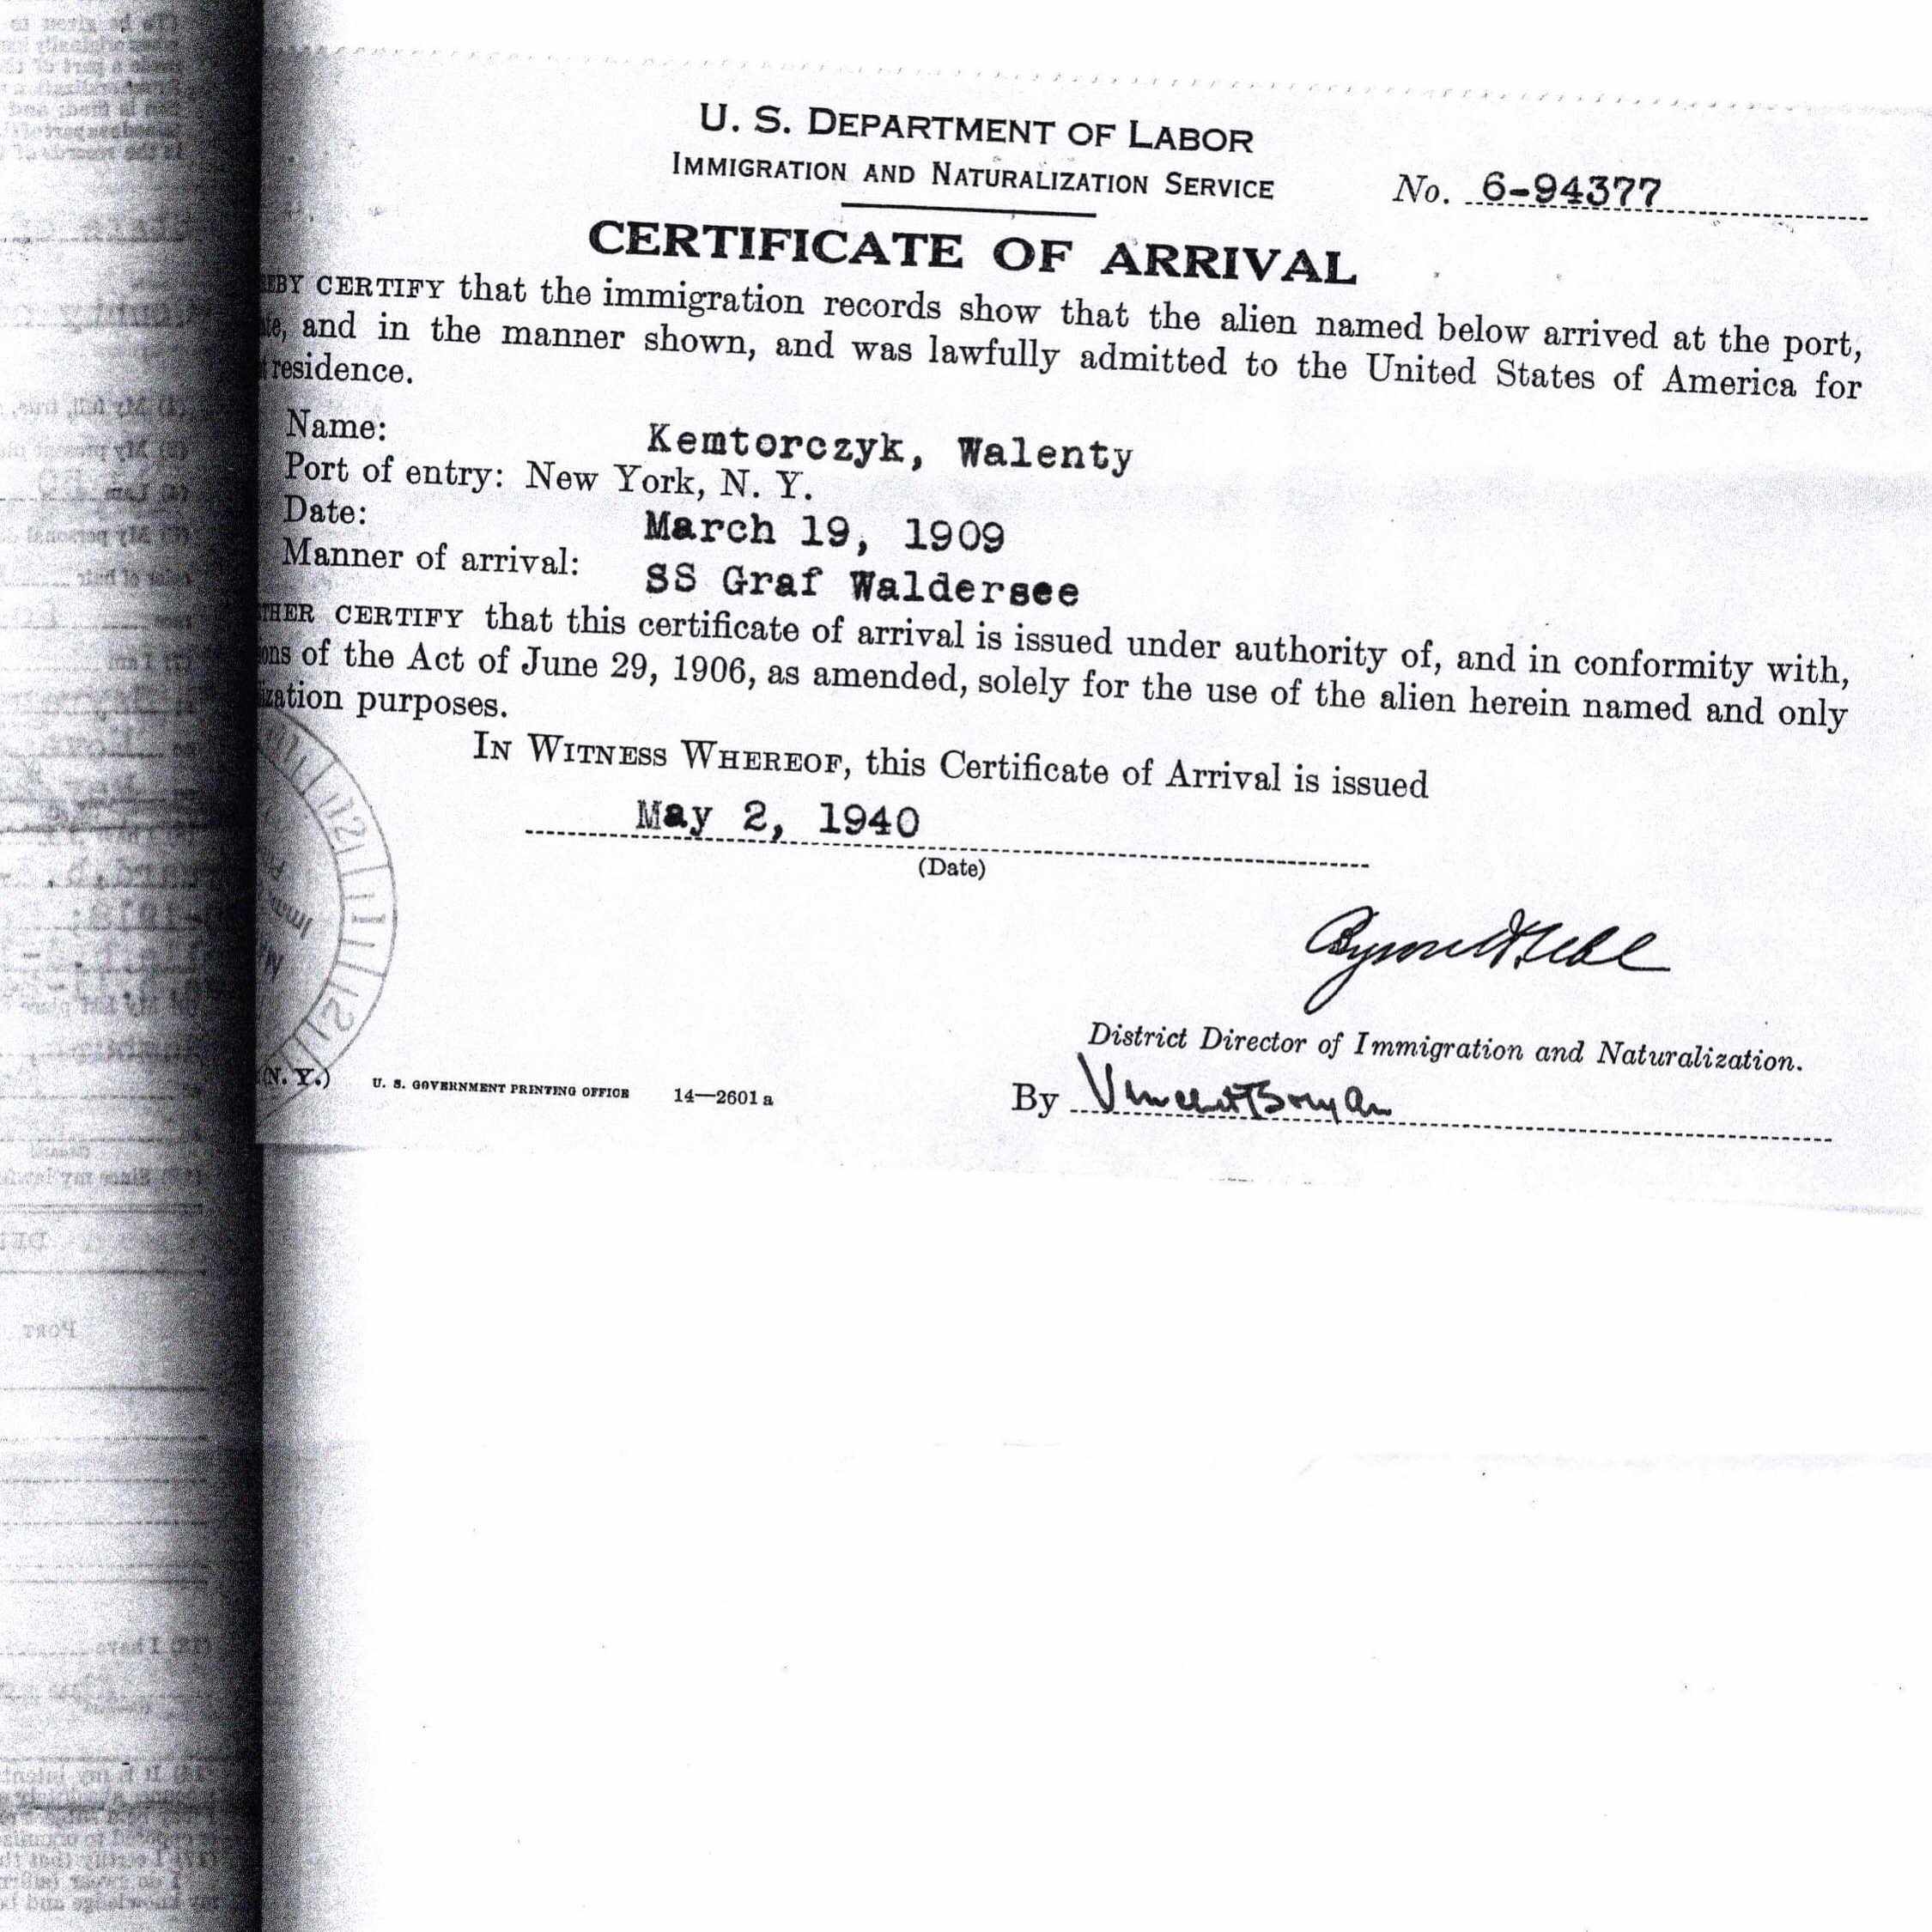 Certificate of Arrival (Naturalization) Walenty Kantorczyk